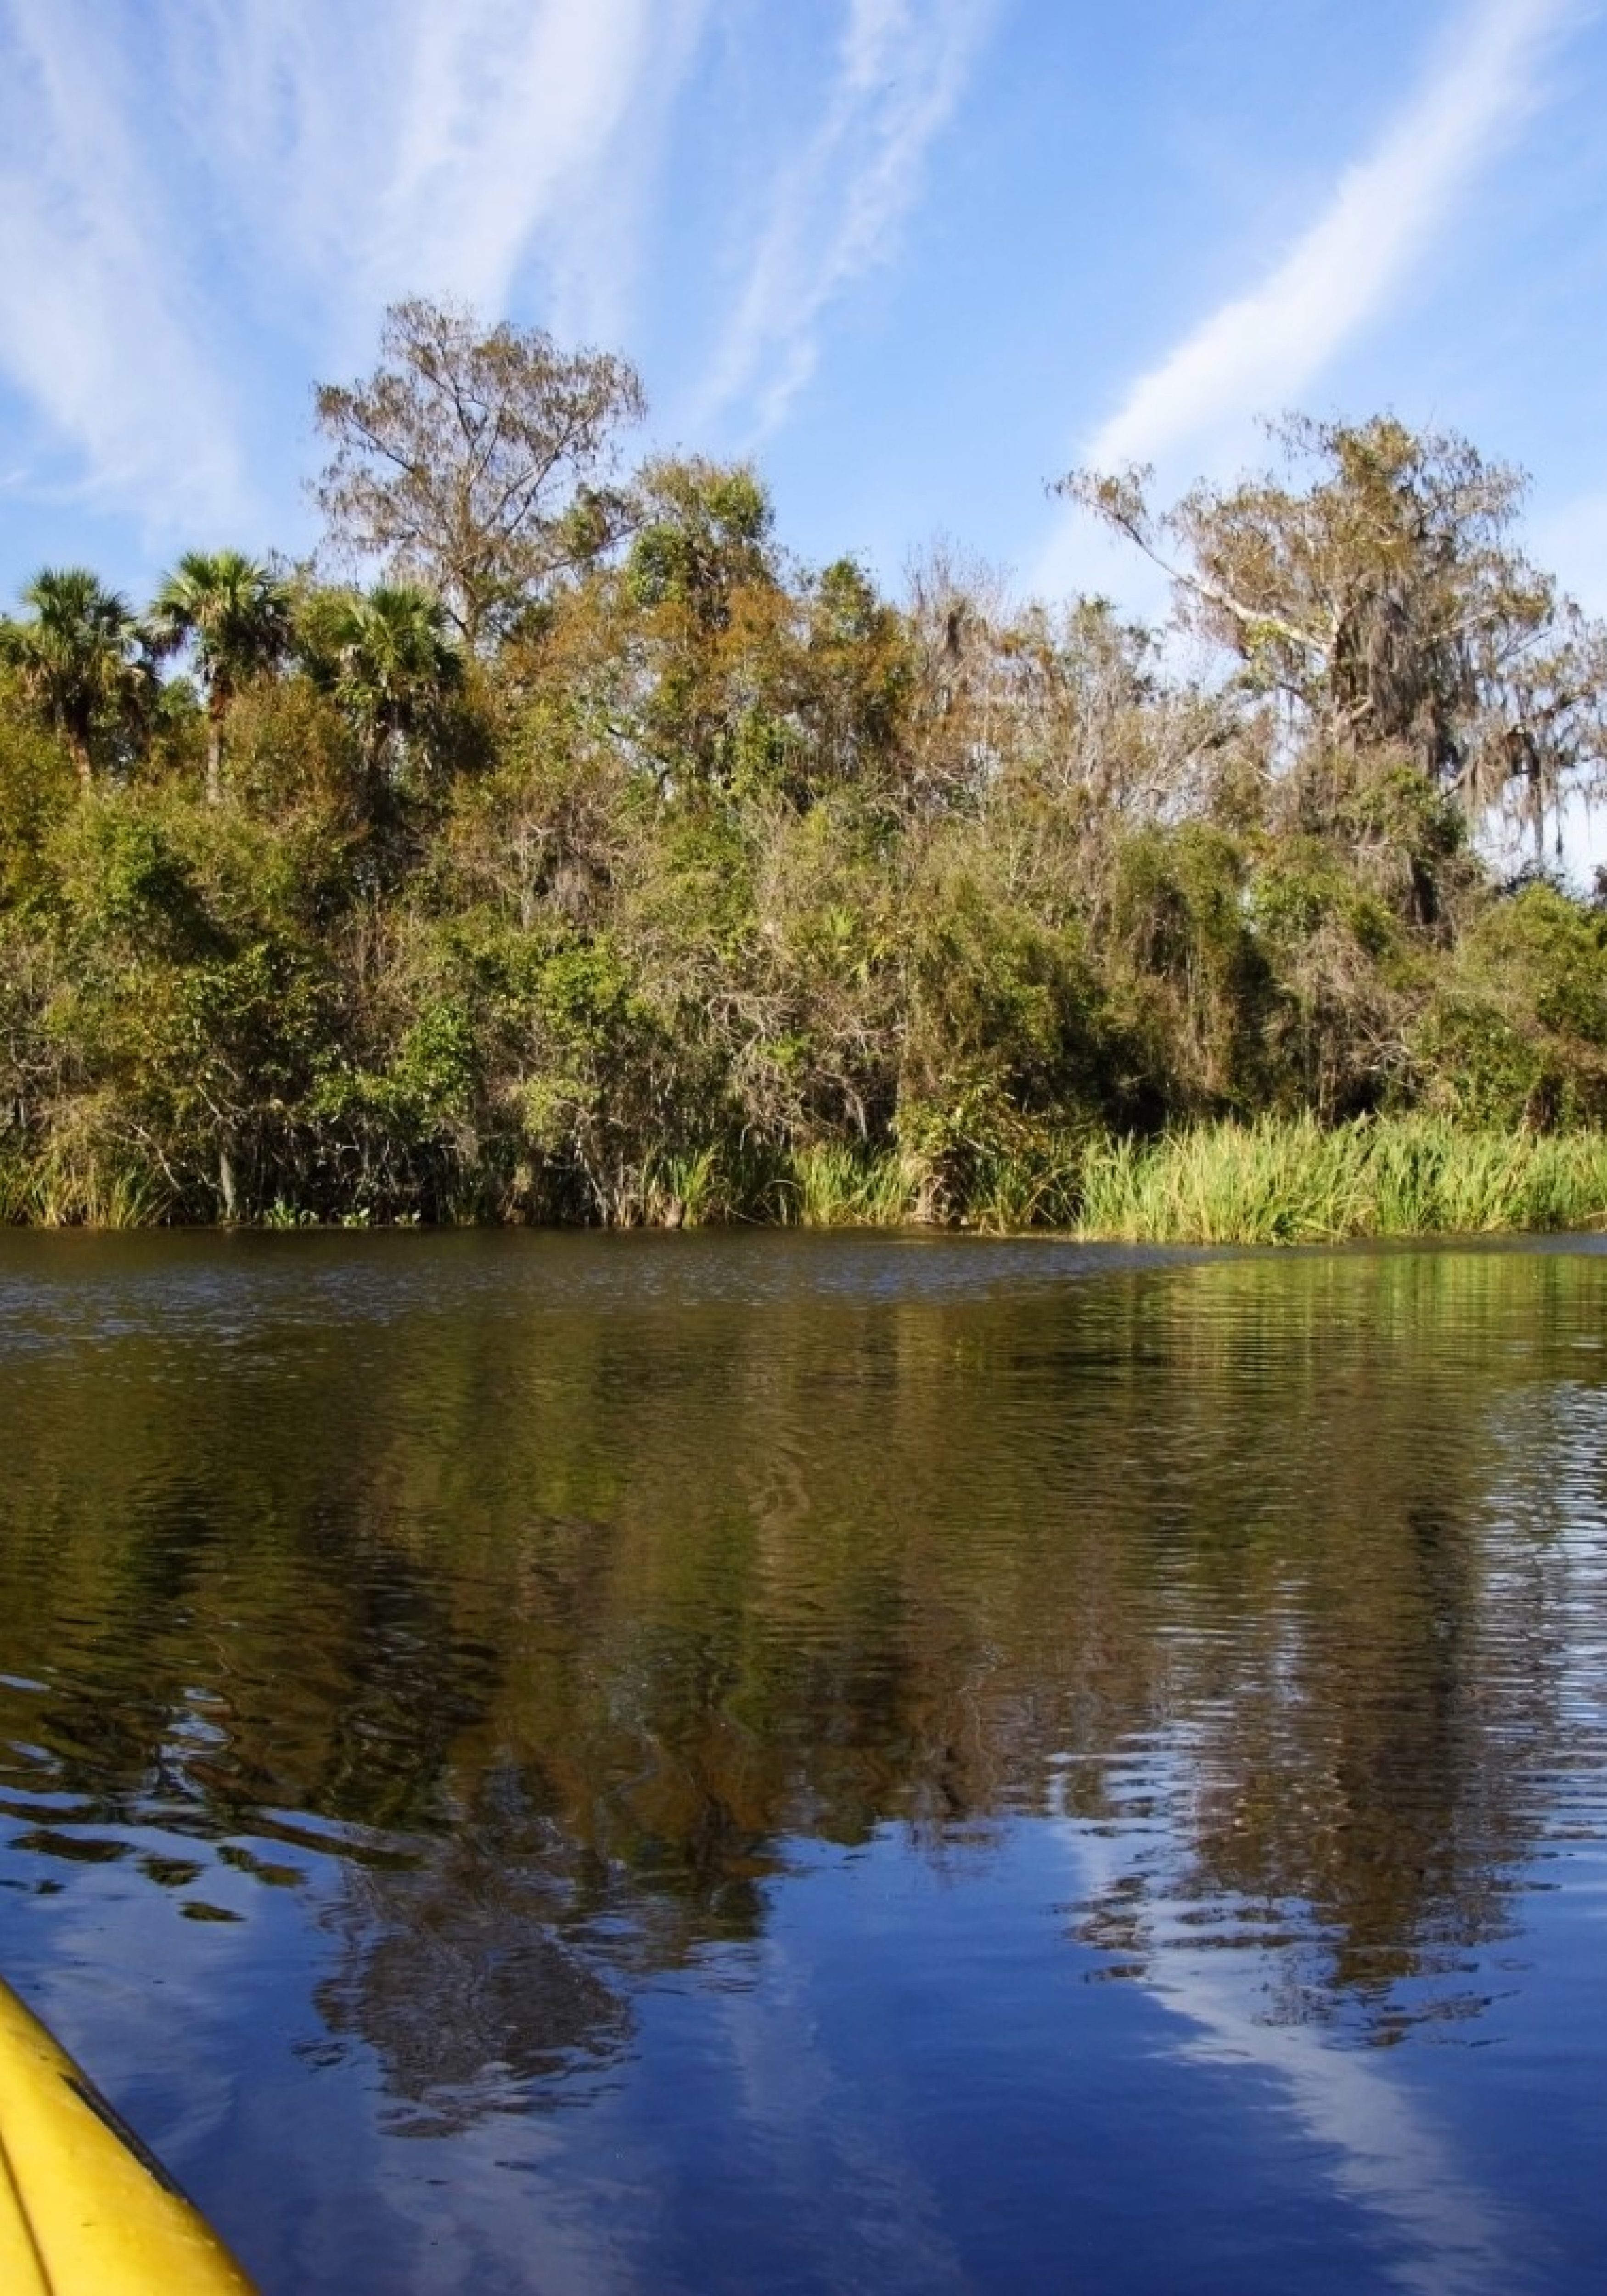 Big-Cypress-National-Preserve-Large-3500x5000.jpg